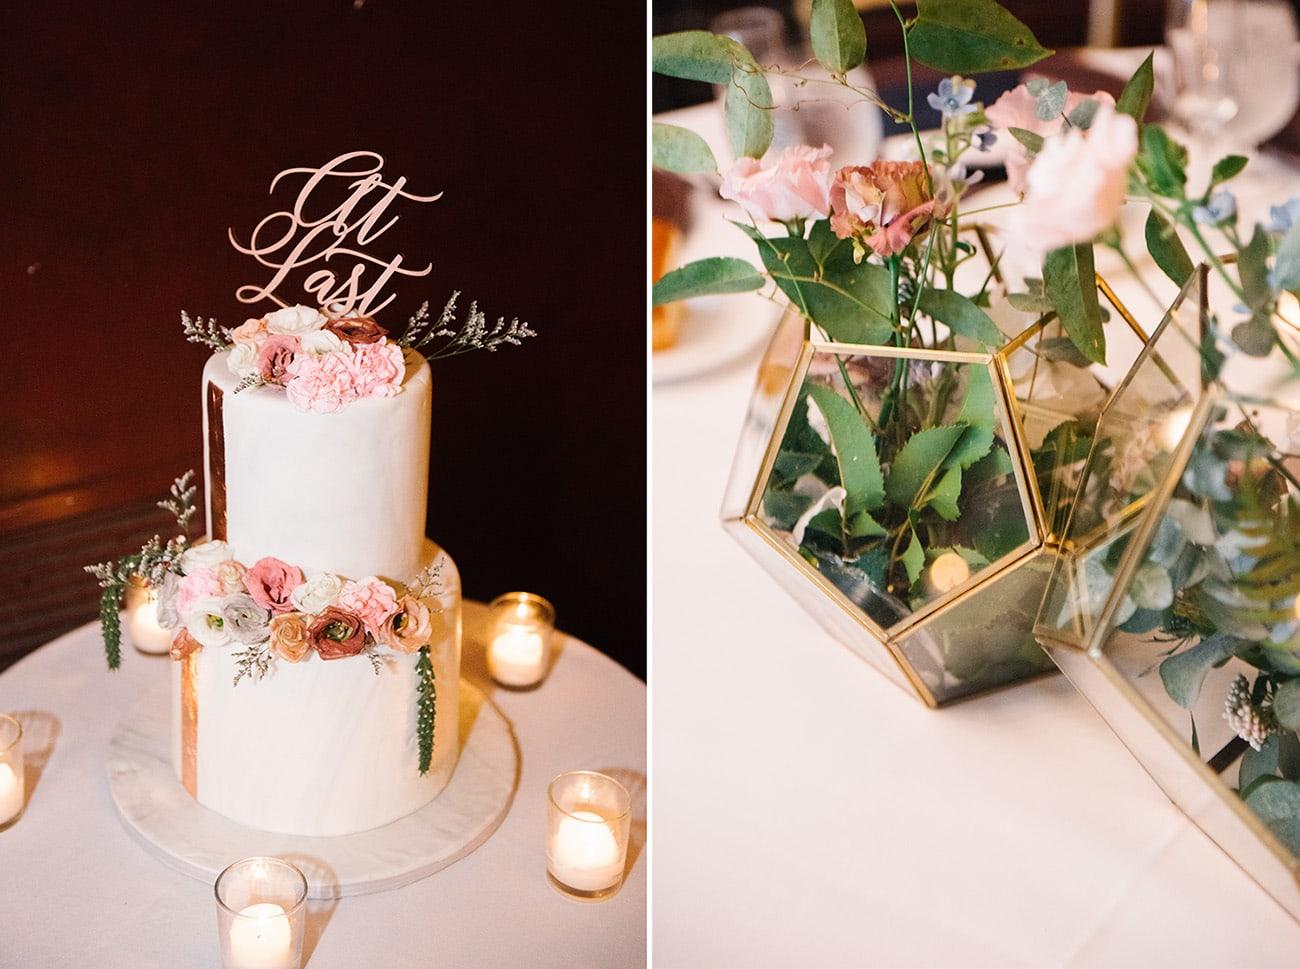 montauk-club-wedding-reception-010-1